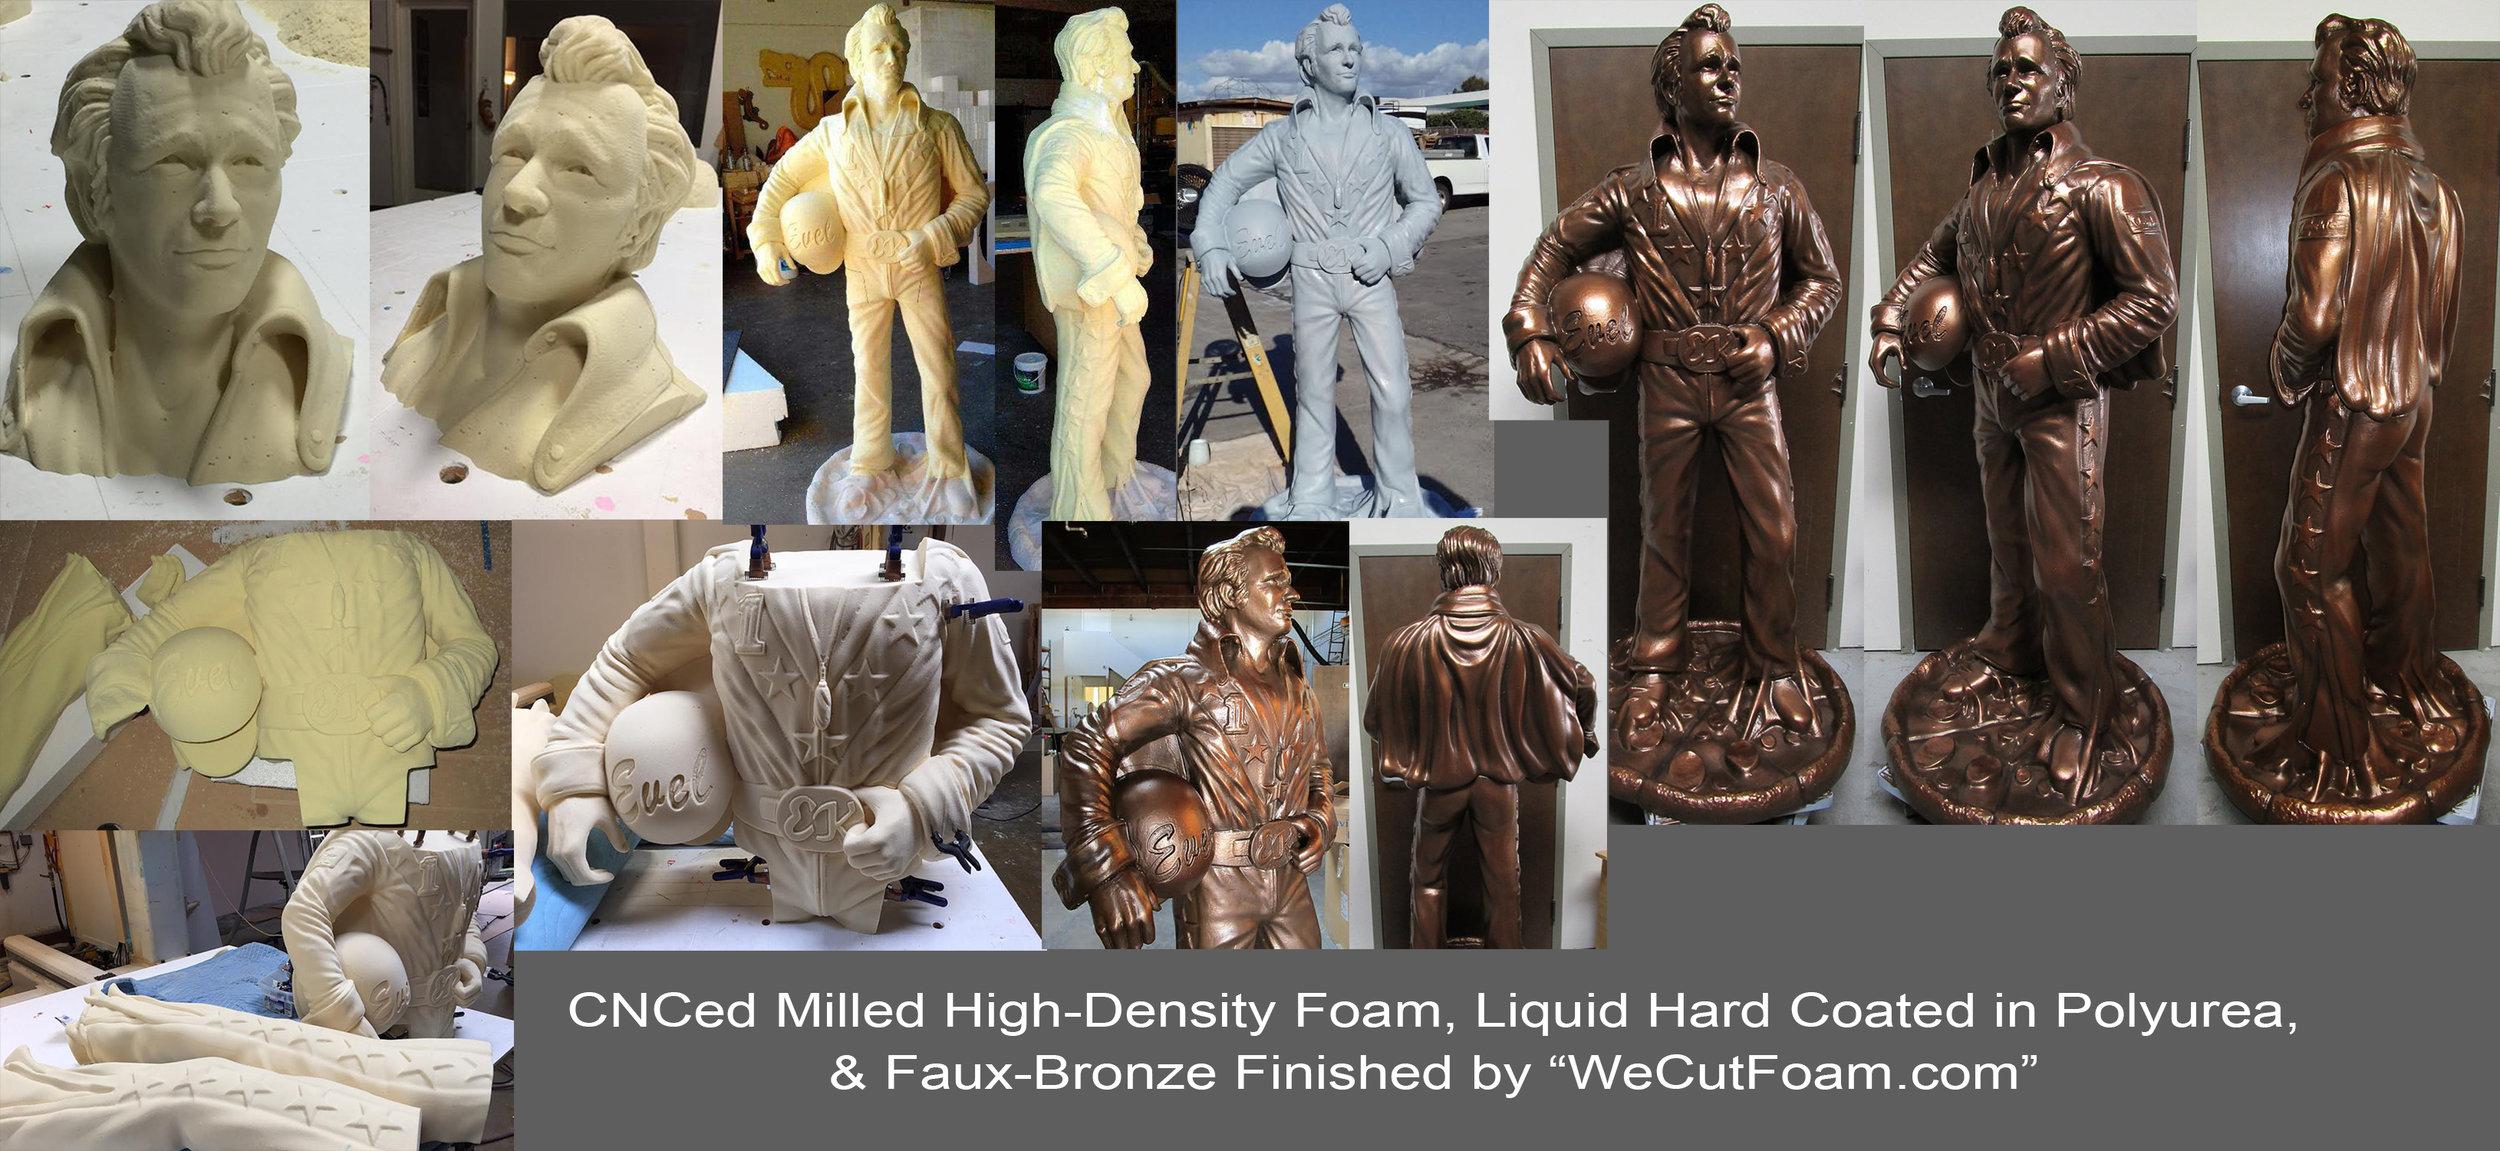 EvelK-Faux-Bronze-Making-of.jpg